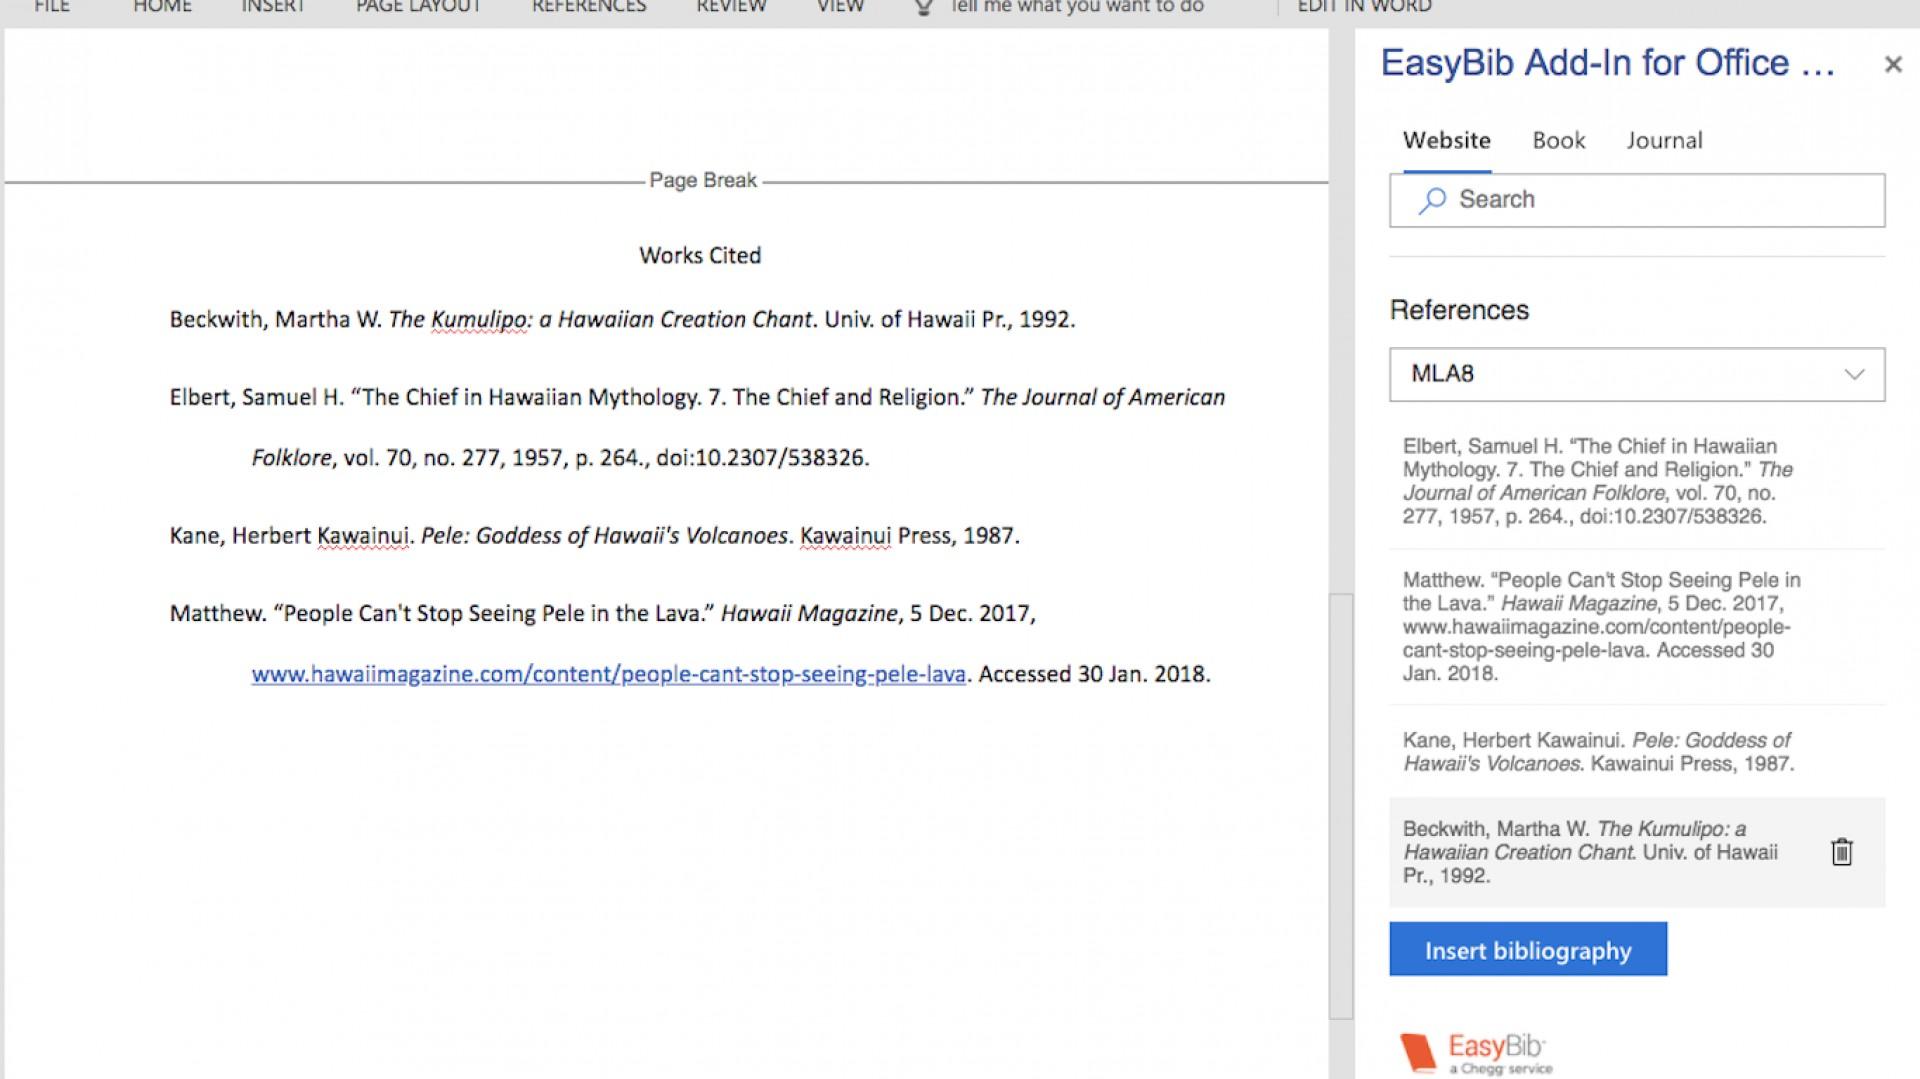 010 Essay Example Bib Fearsome Easybib Mla Works Cited Chicago Citation Generator Apa Format 1920